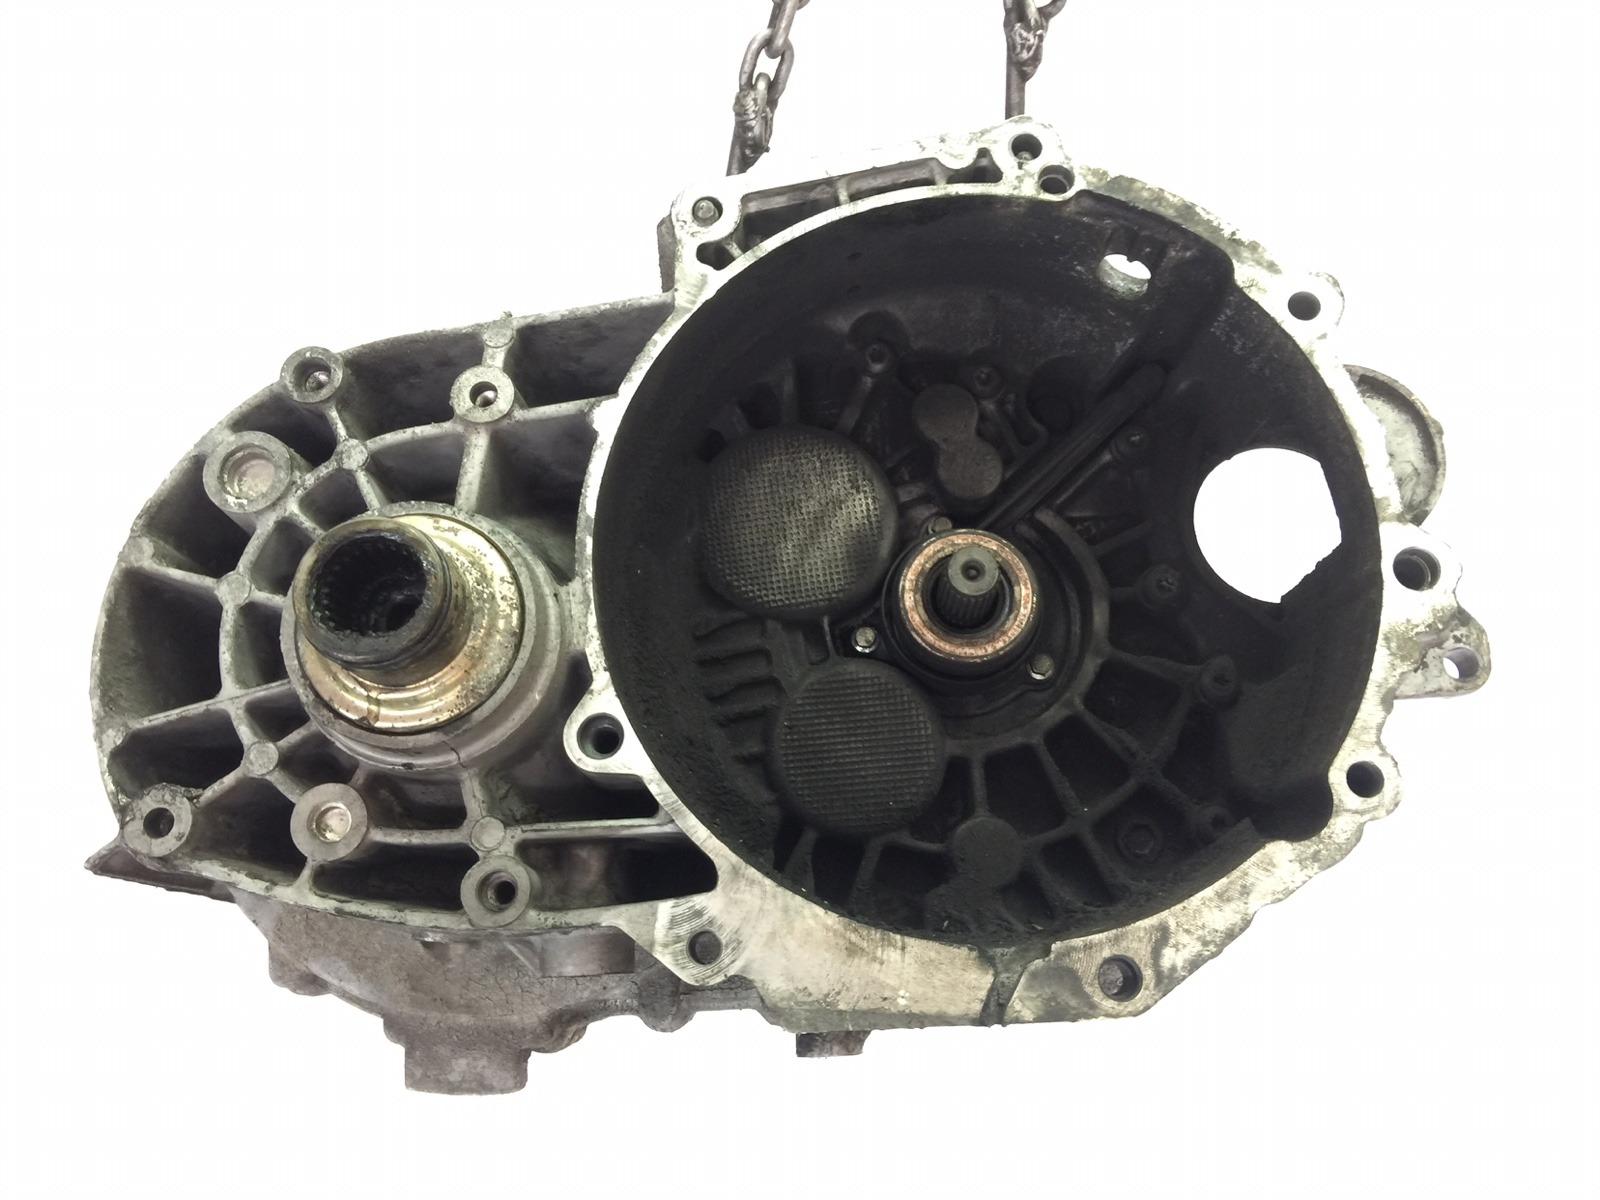 Кпп механическая (мкпп) Volkswagen Sharan 1.9 TDI 2005 (б/у)